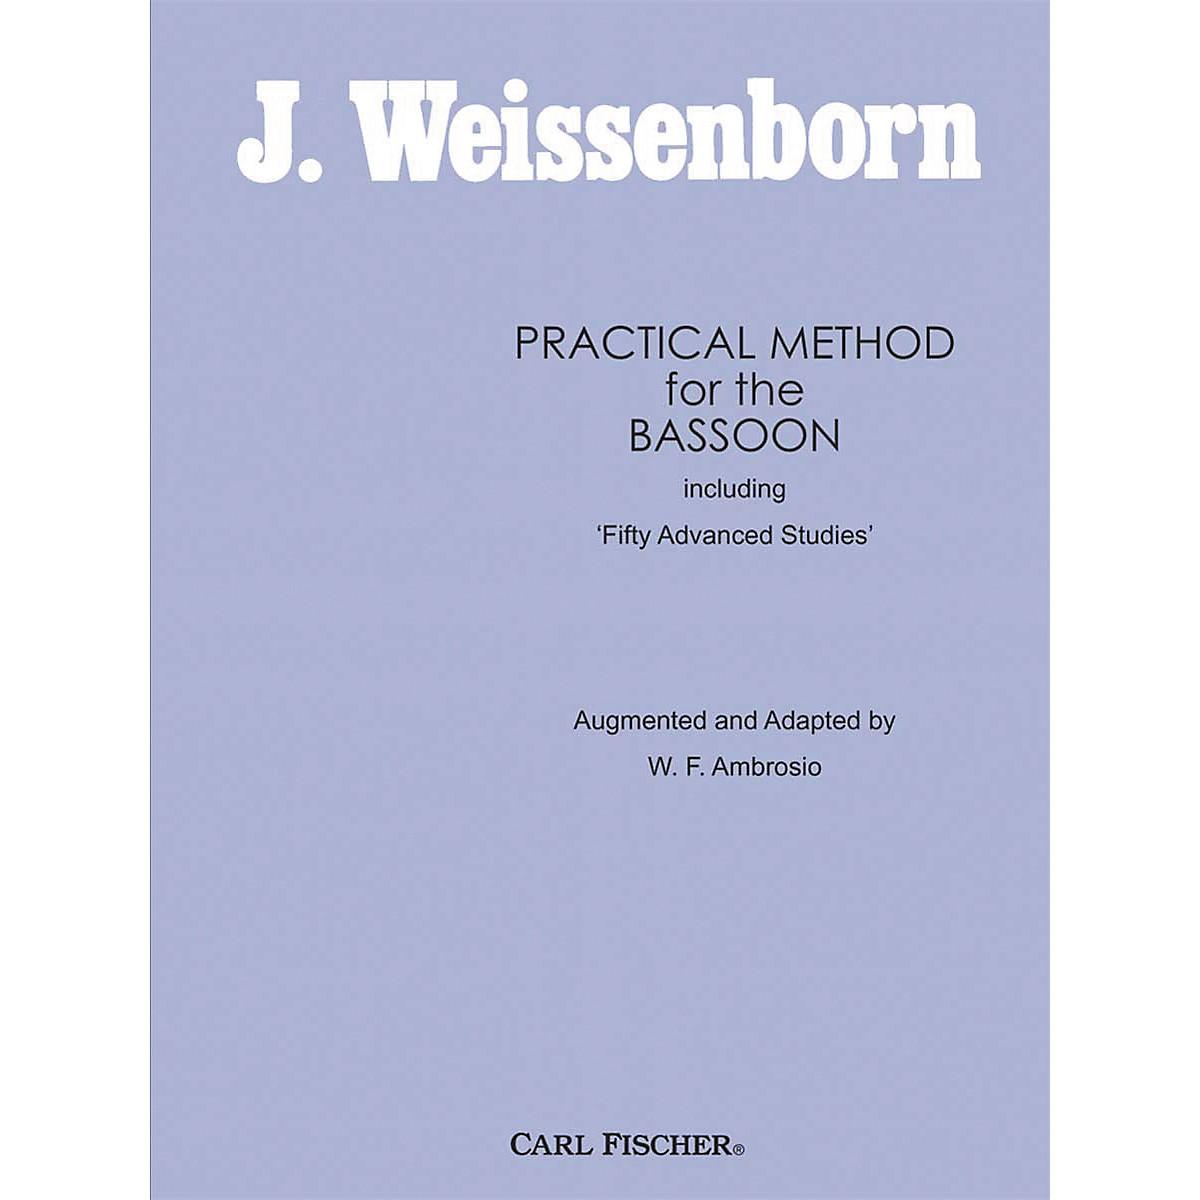 Carl Fischer Practical Method For The Bassoon